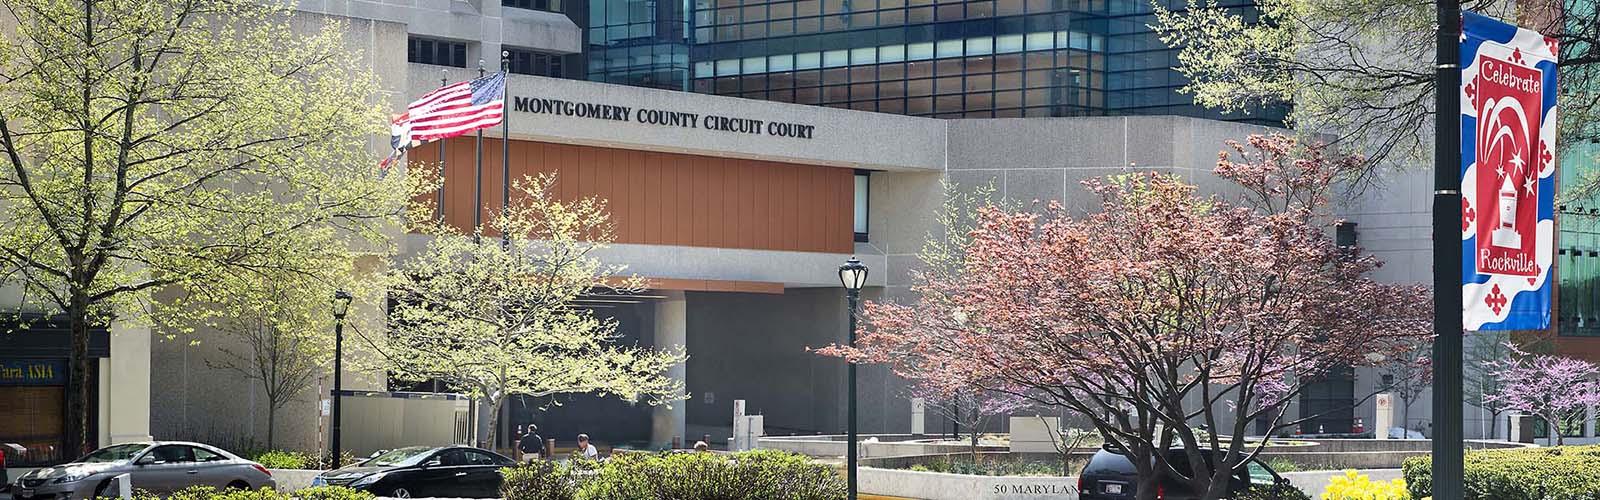 Montgomery County, MD Circuit Court. | Photo: montgomerycountymd.gov